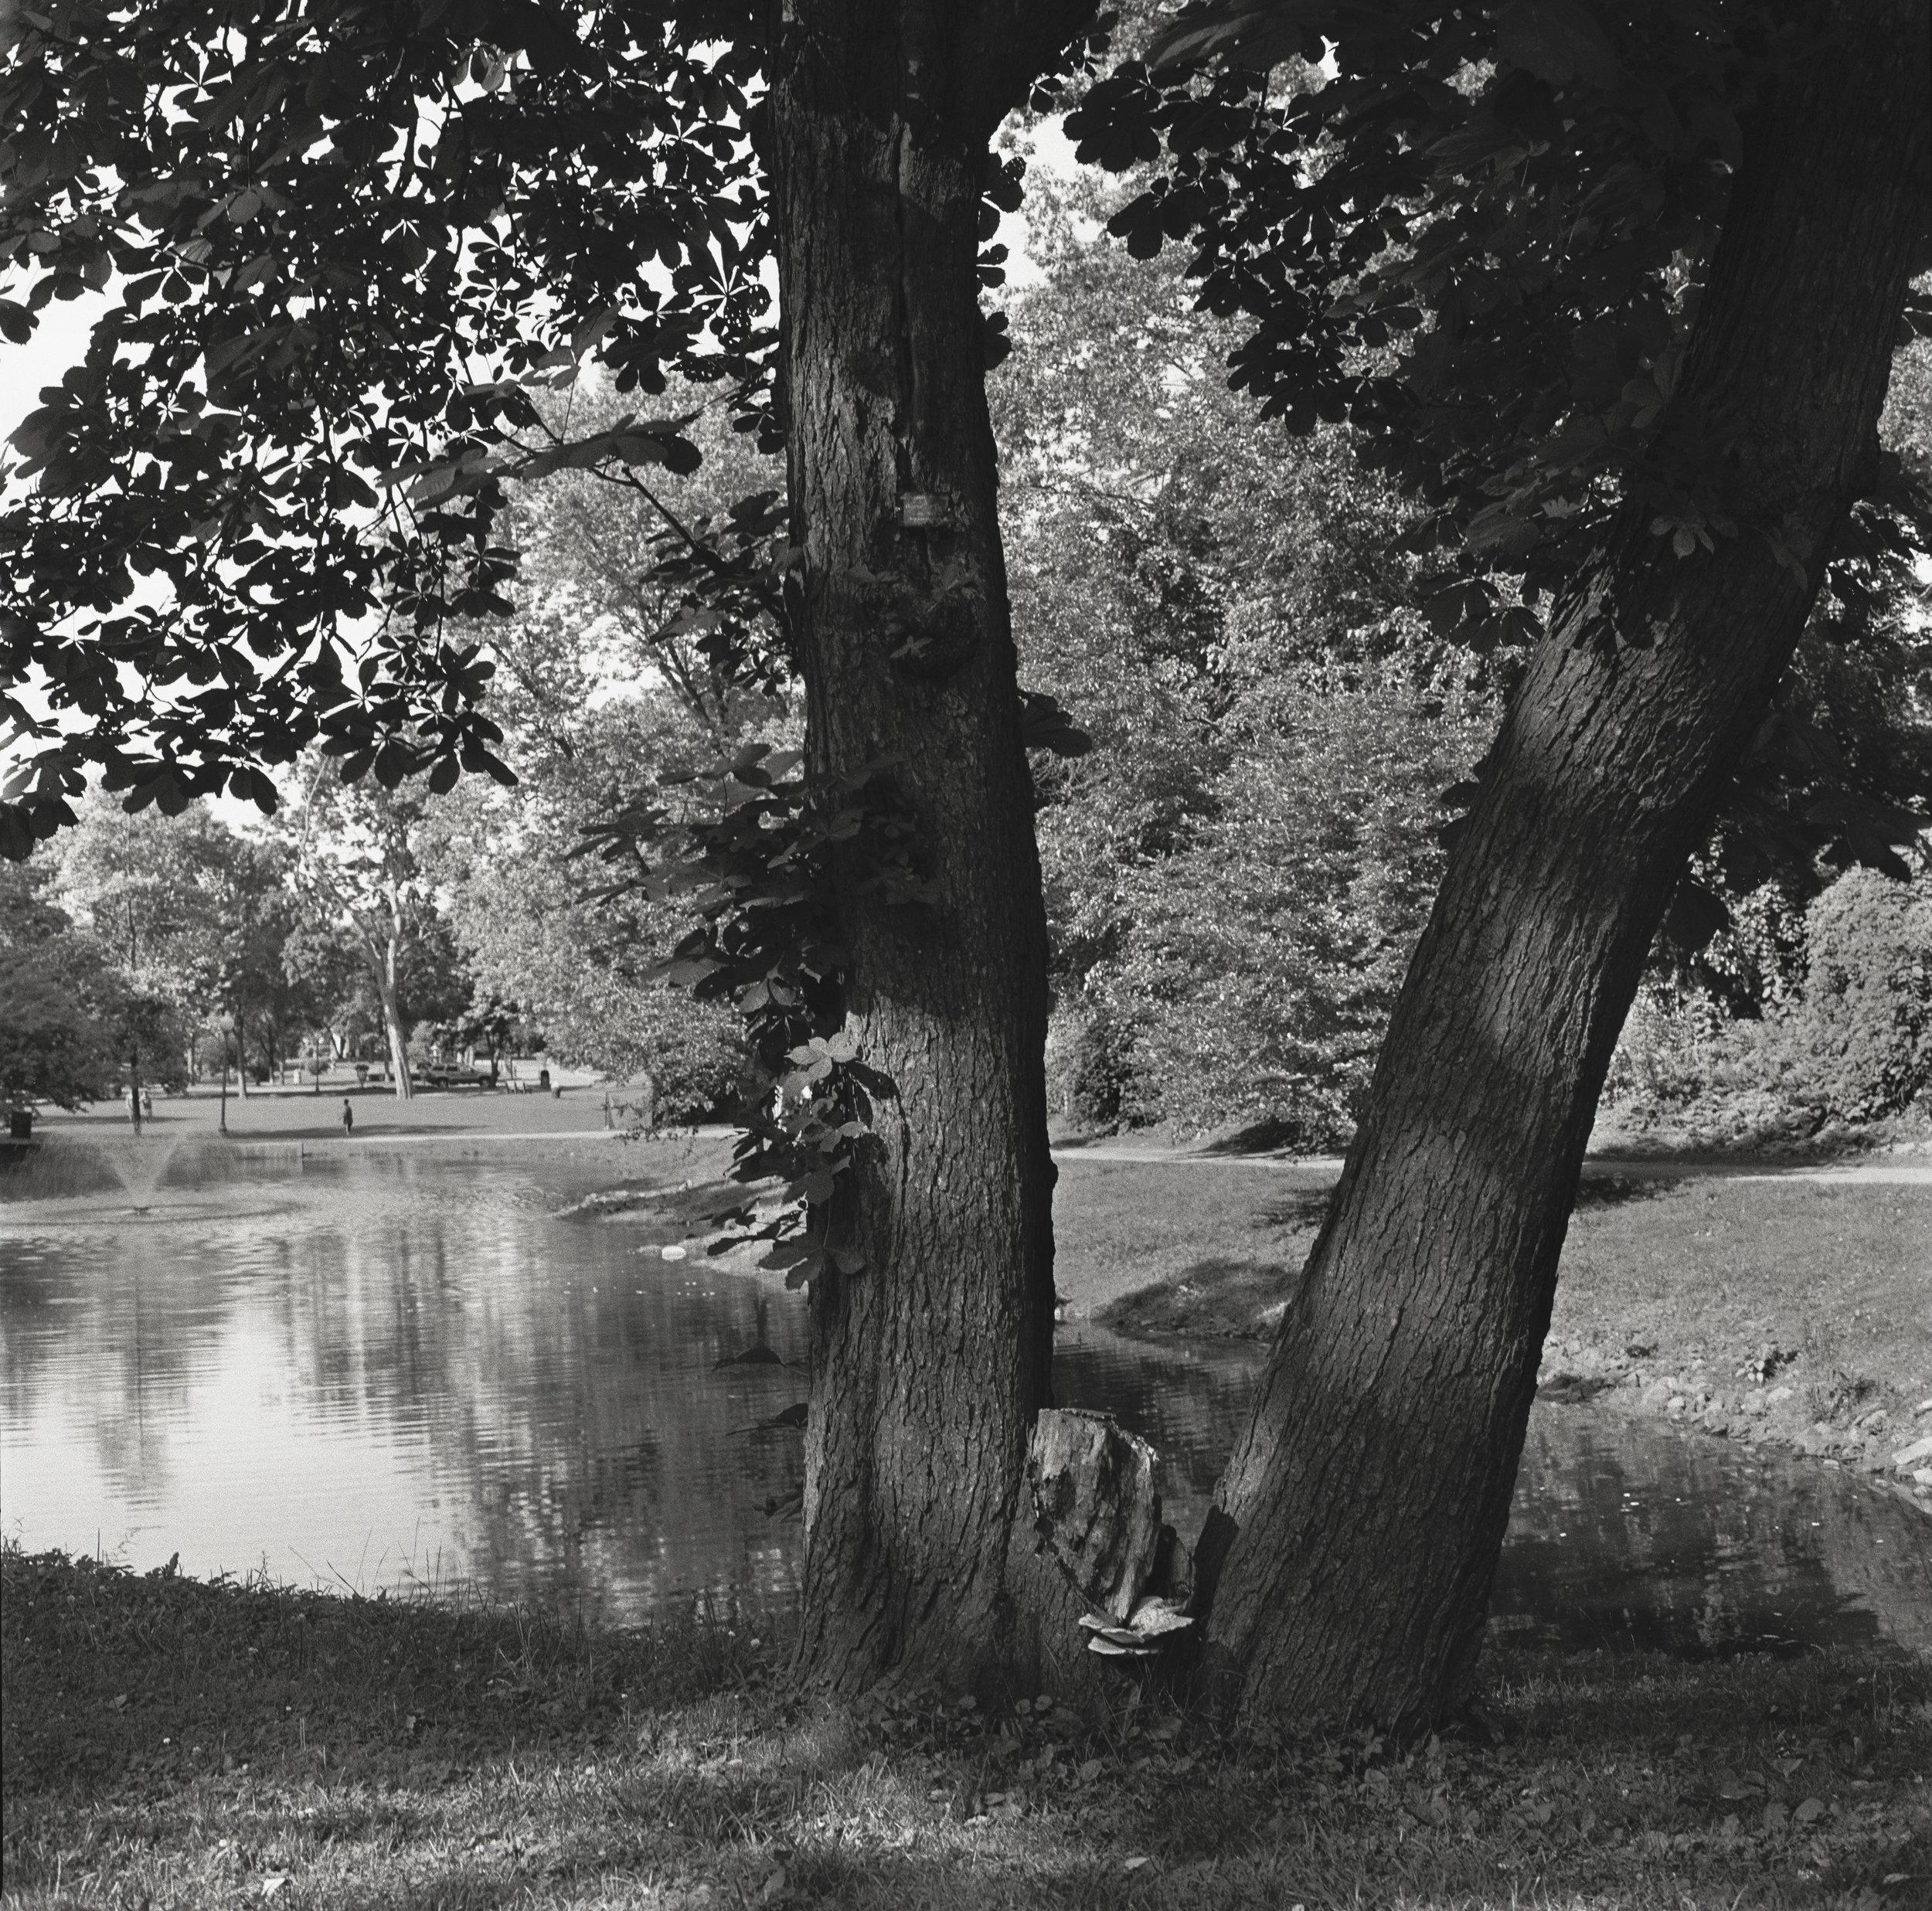 Congress Park, Saratoga Springs, New York, 2015